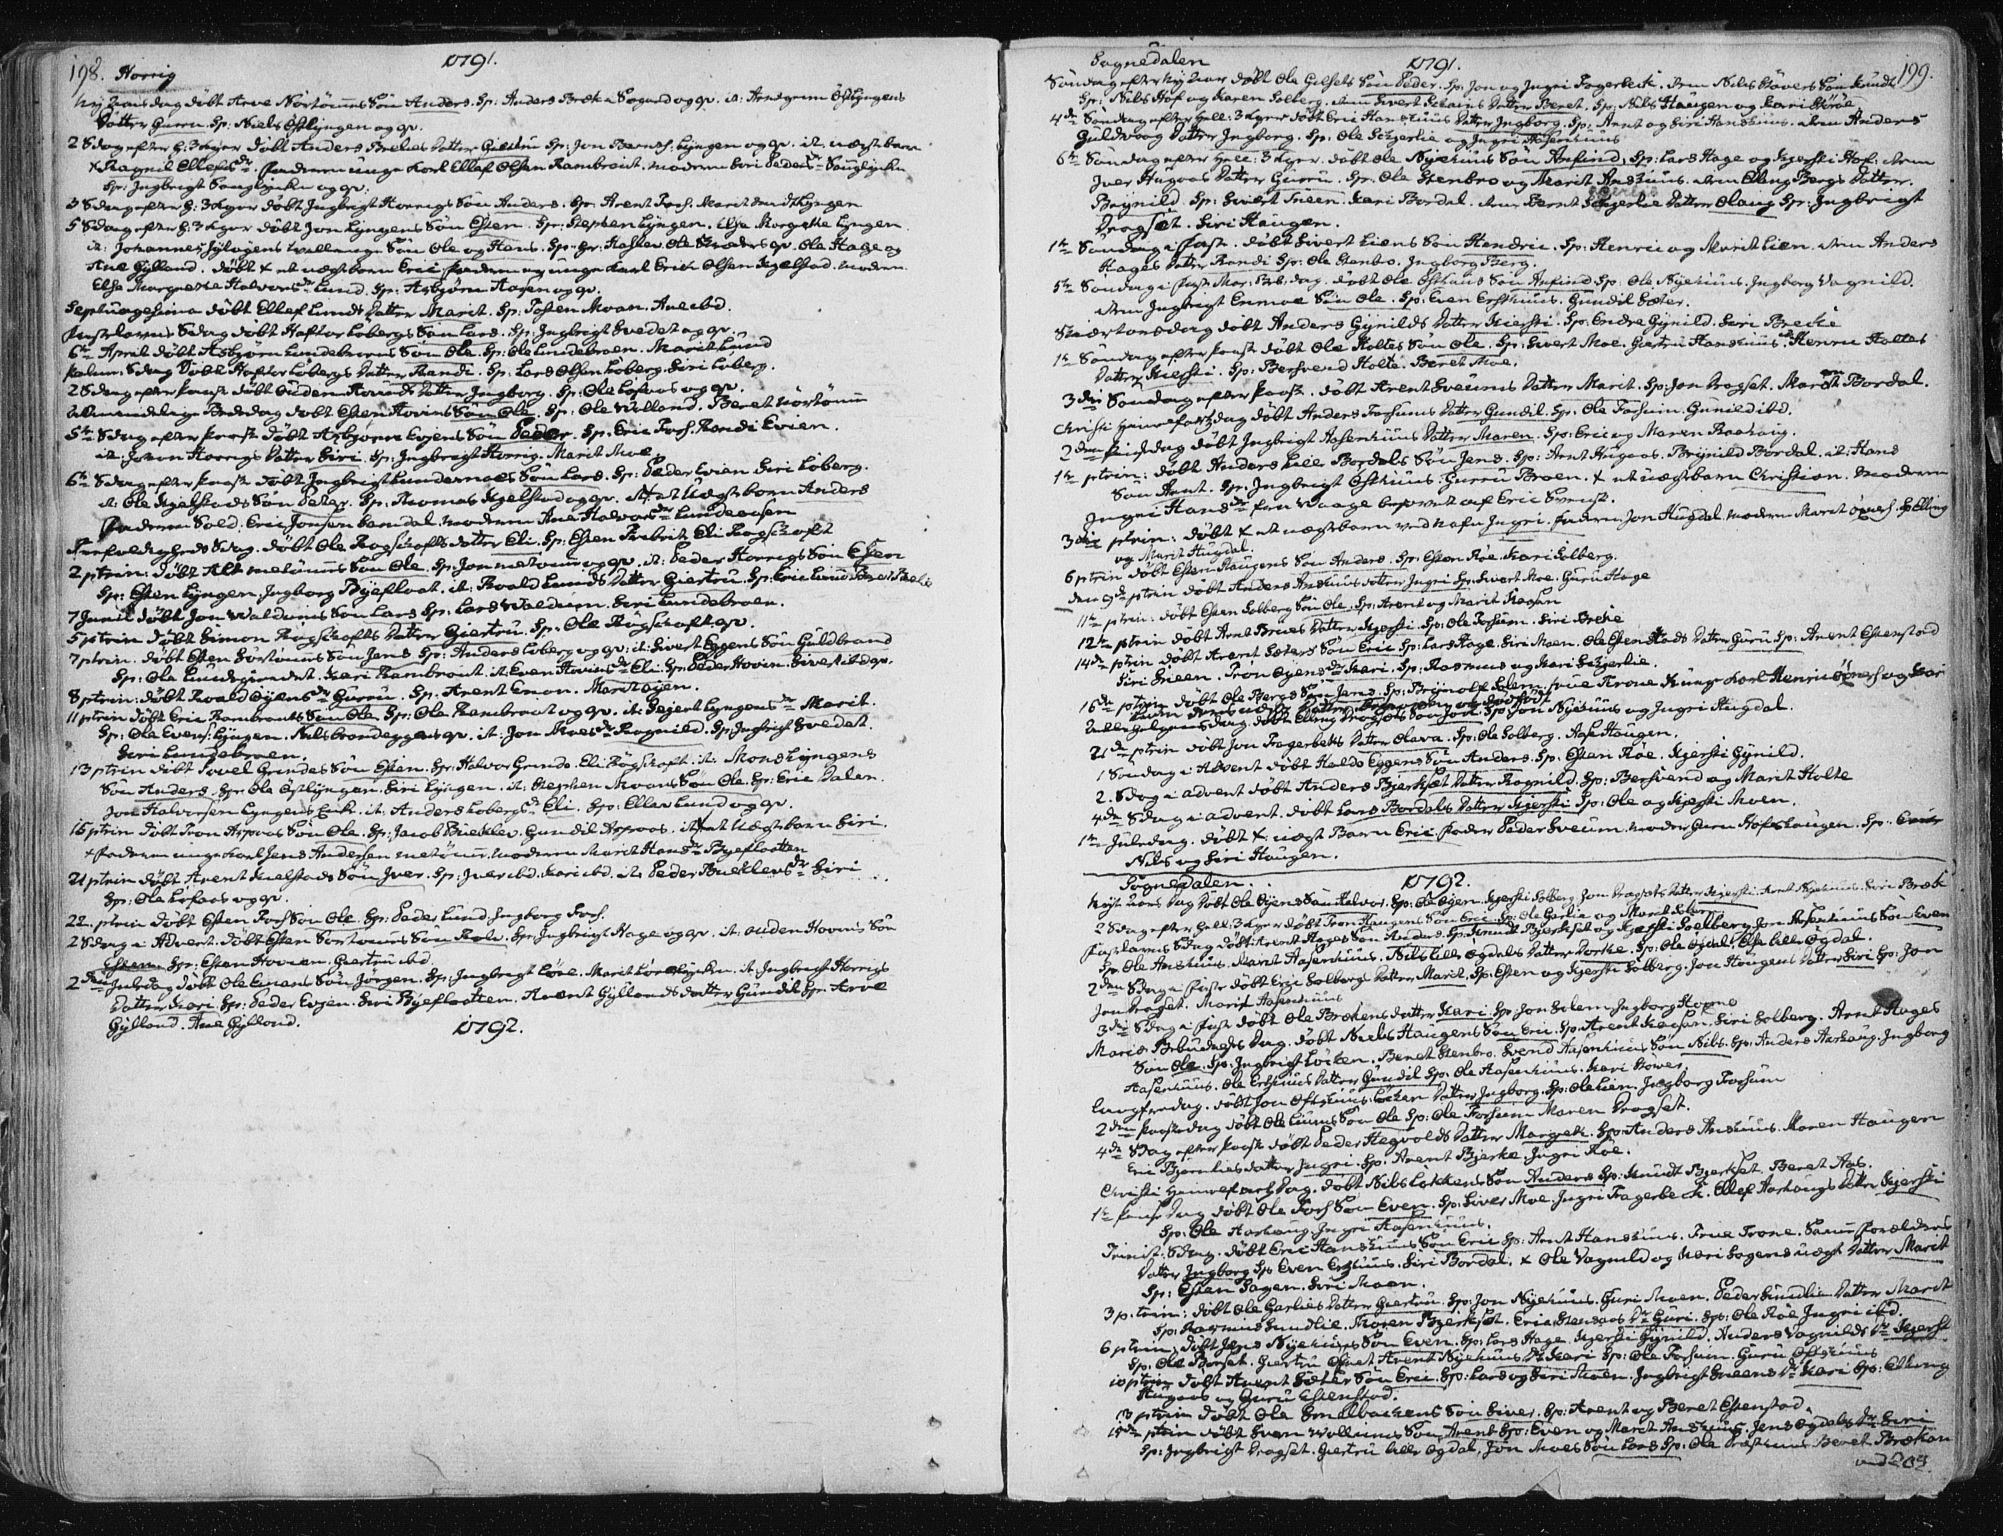 SAT, Ministerialprotokoller, klokkerbøker og fødselsregistre - Sør-Trøndelag, 687/L0992: Parish register (official) no. 687A03 /1, 1788-1815, p. 198-199